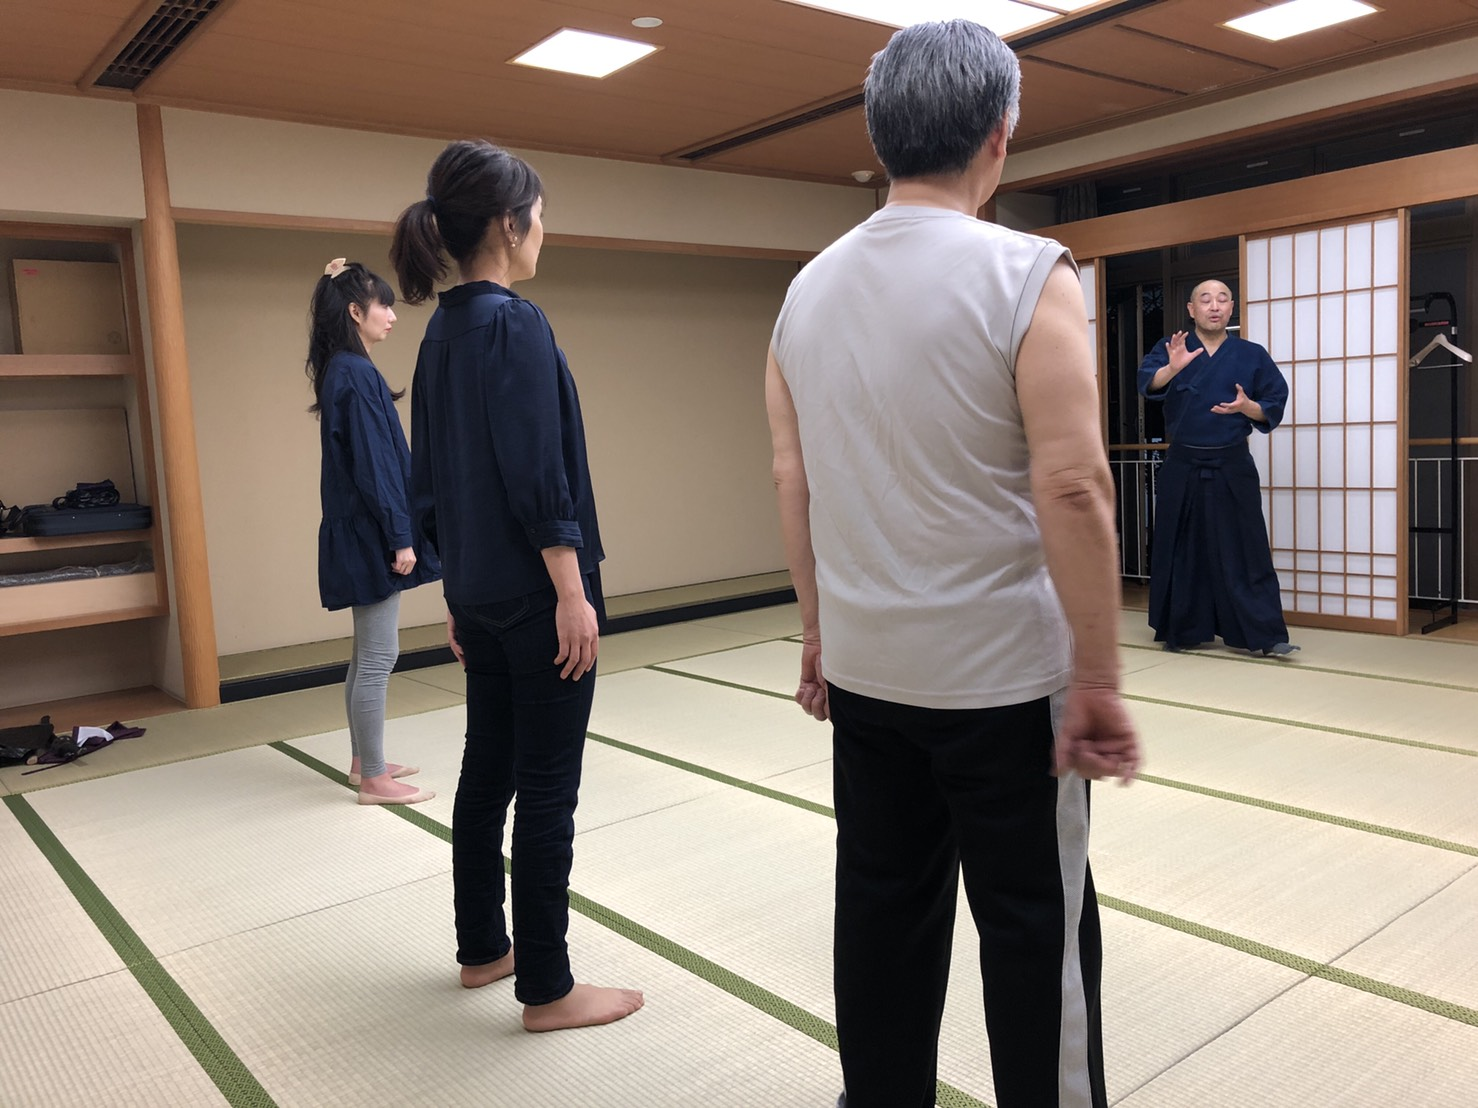 S  84181023 - 釈正輪老師、武道礼法&呼吸法開催